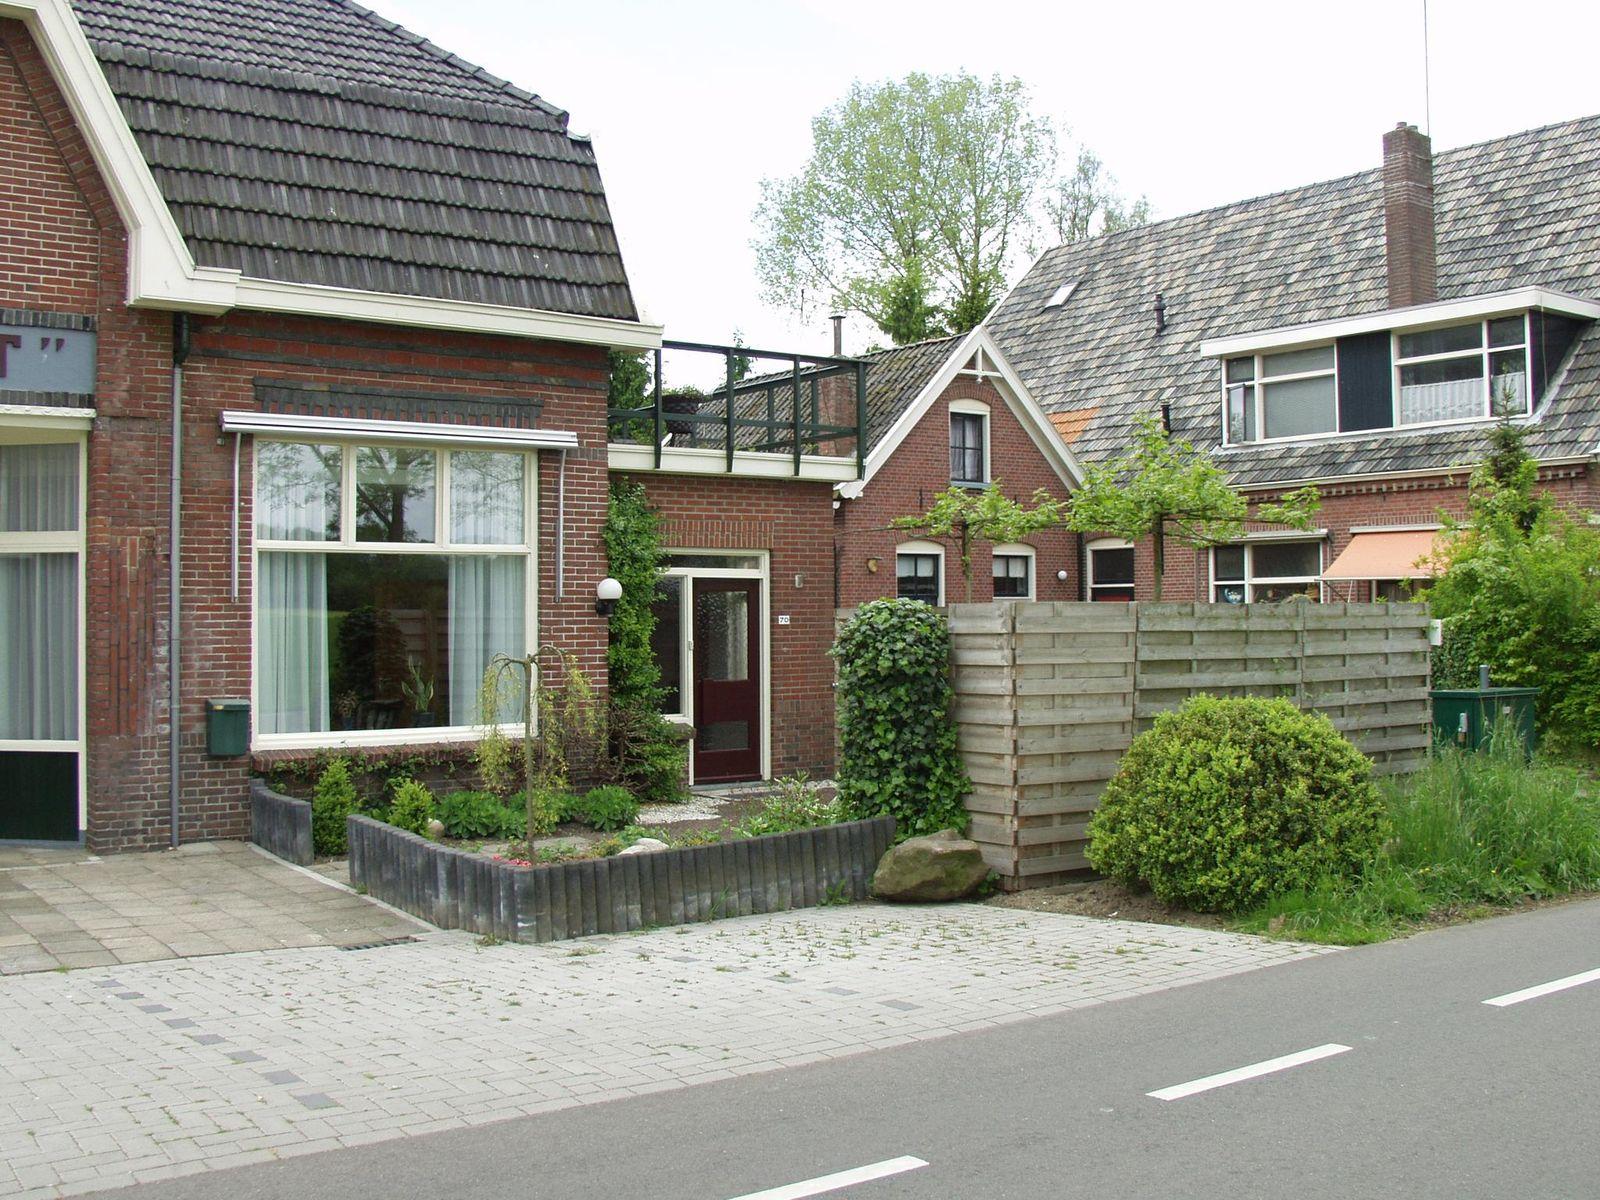 Wooldseweg 70, Winterswijk Woold